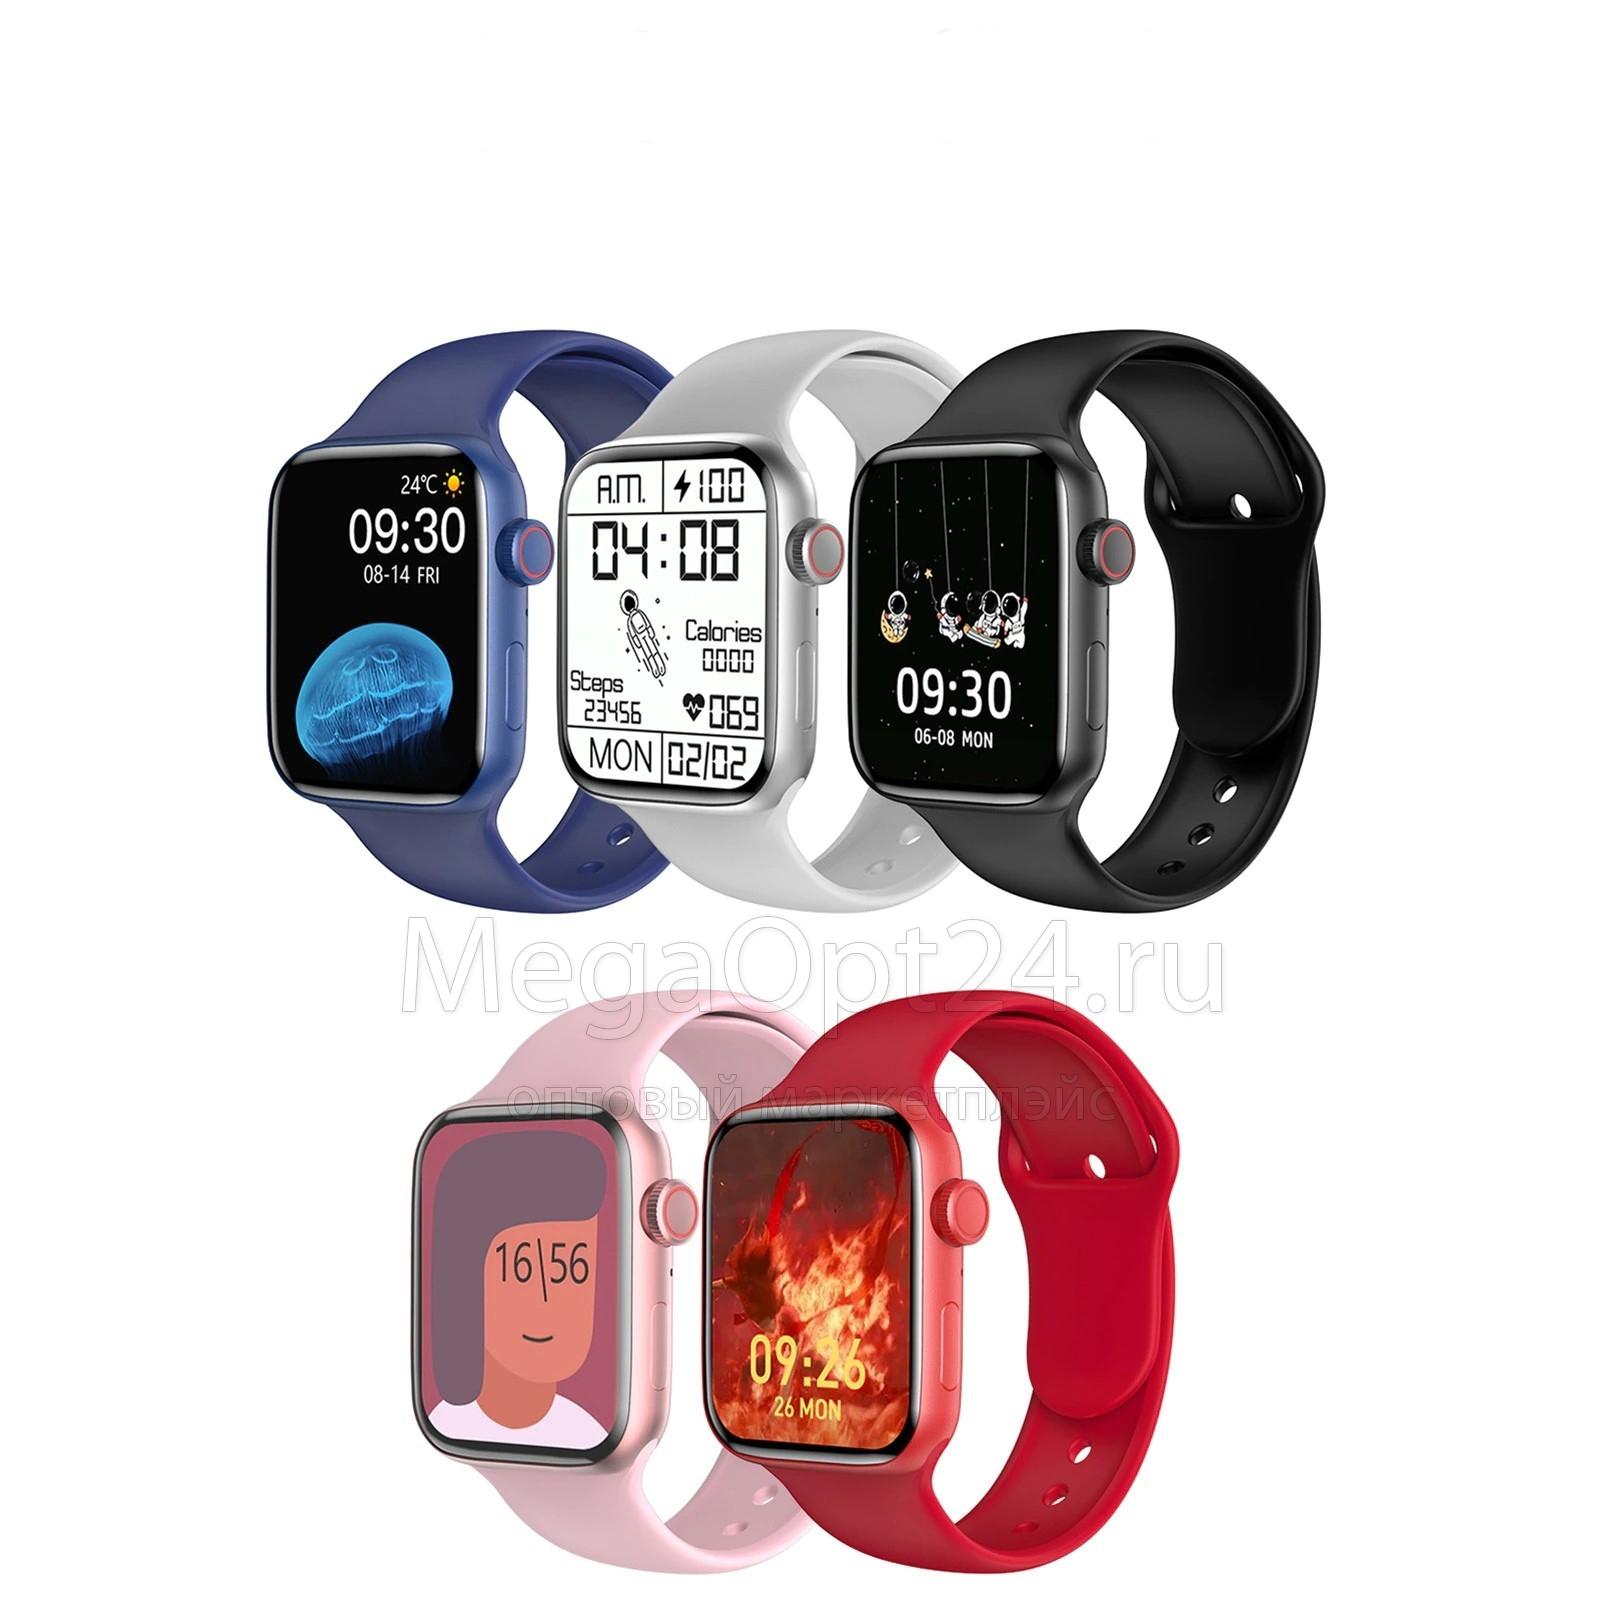 Умные часы Smart Watch HW22 Plus оптом